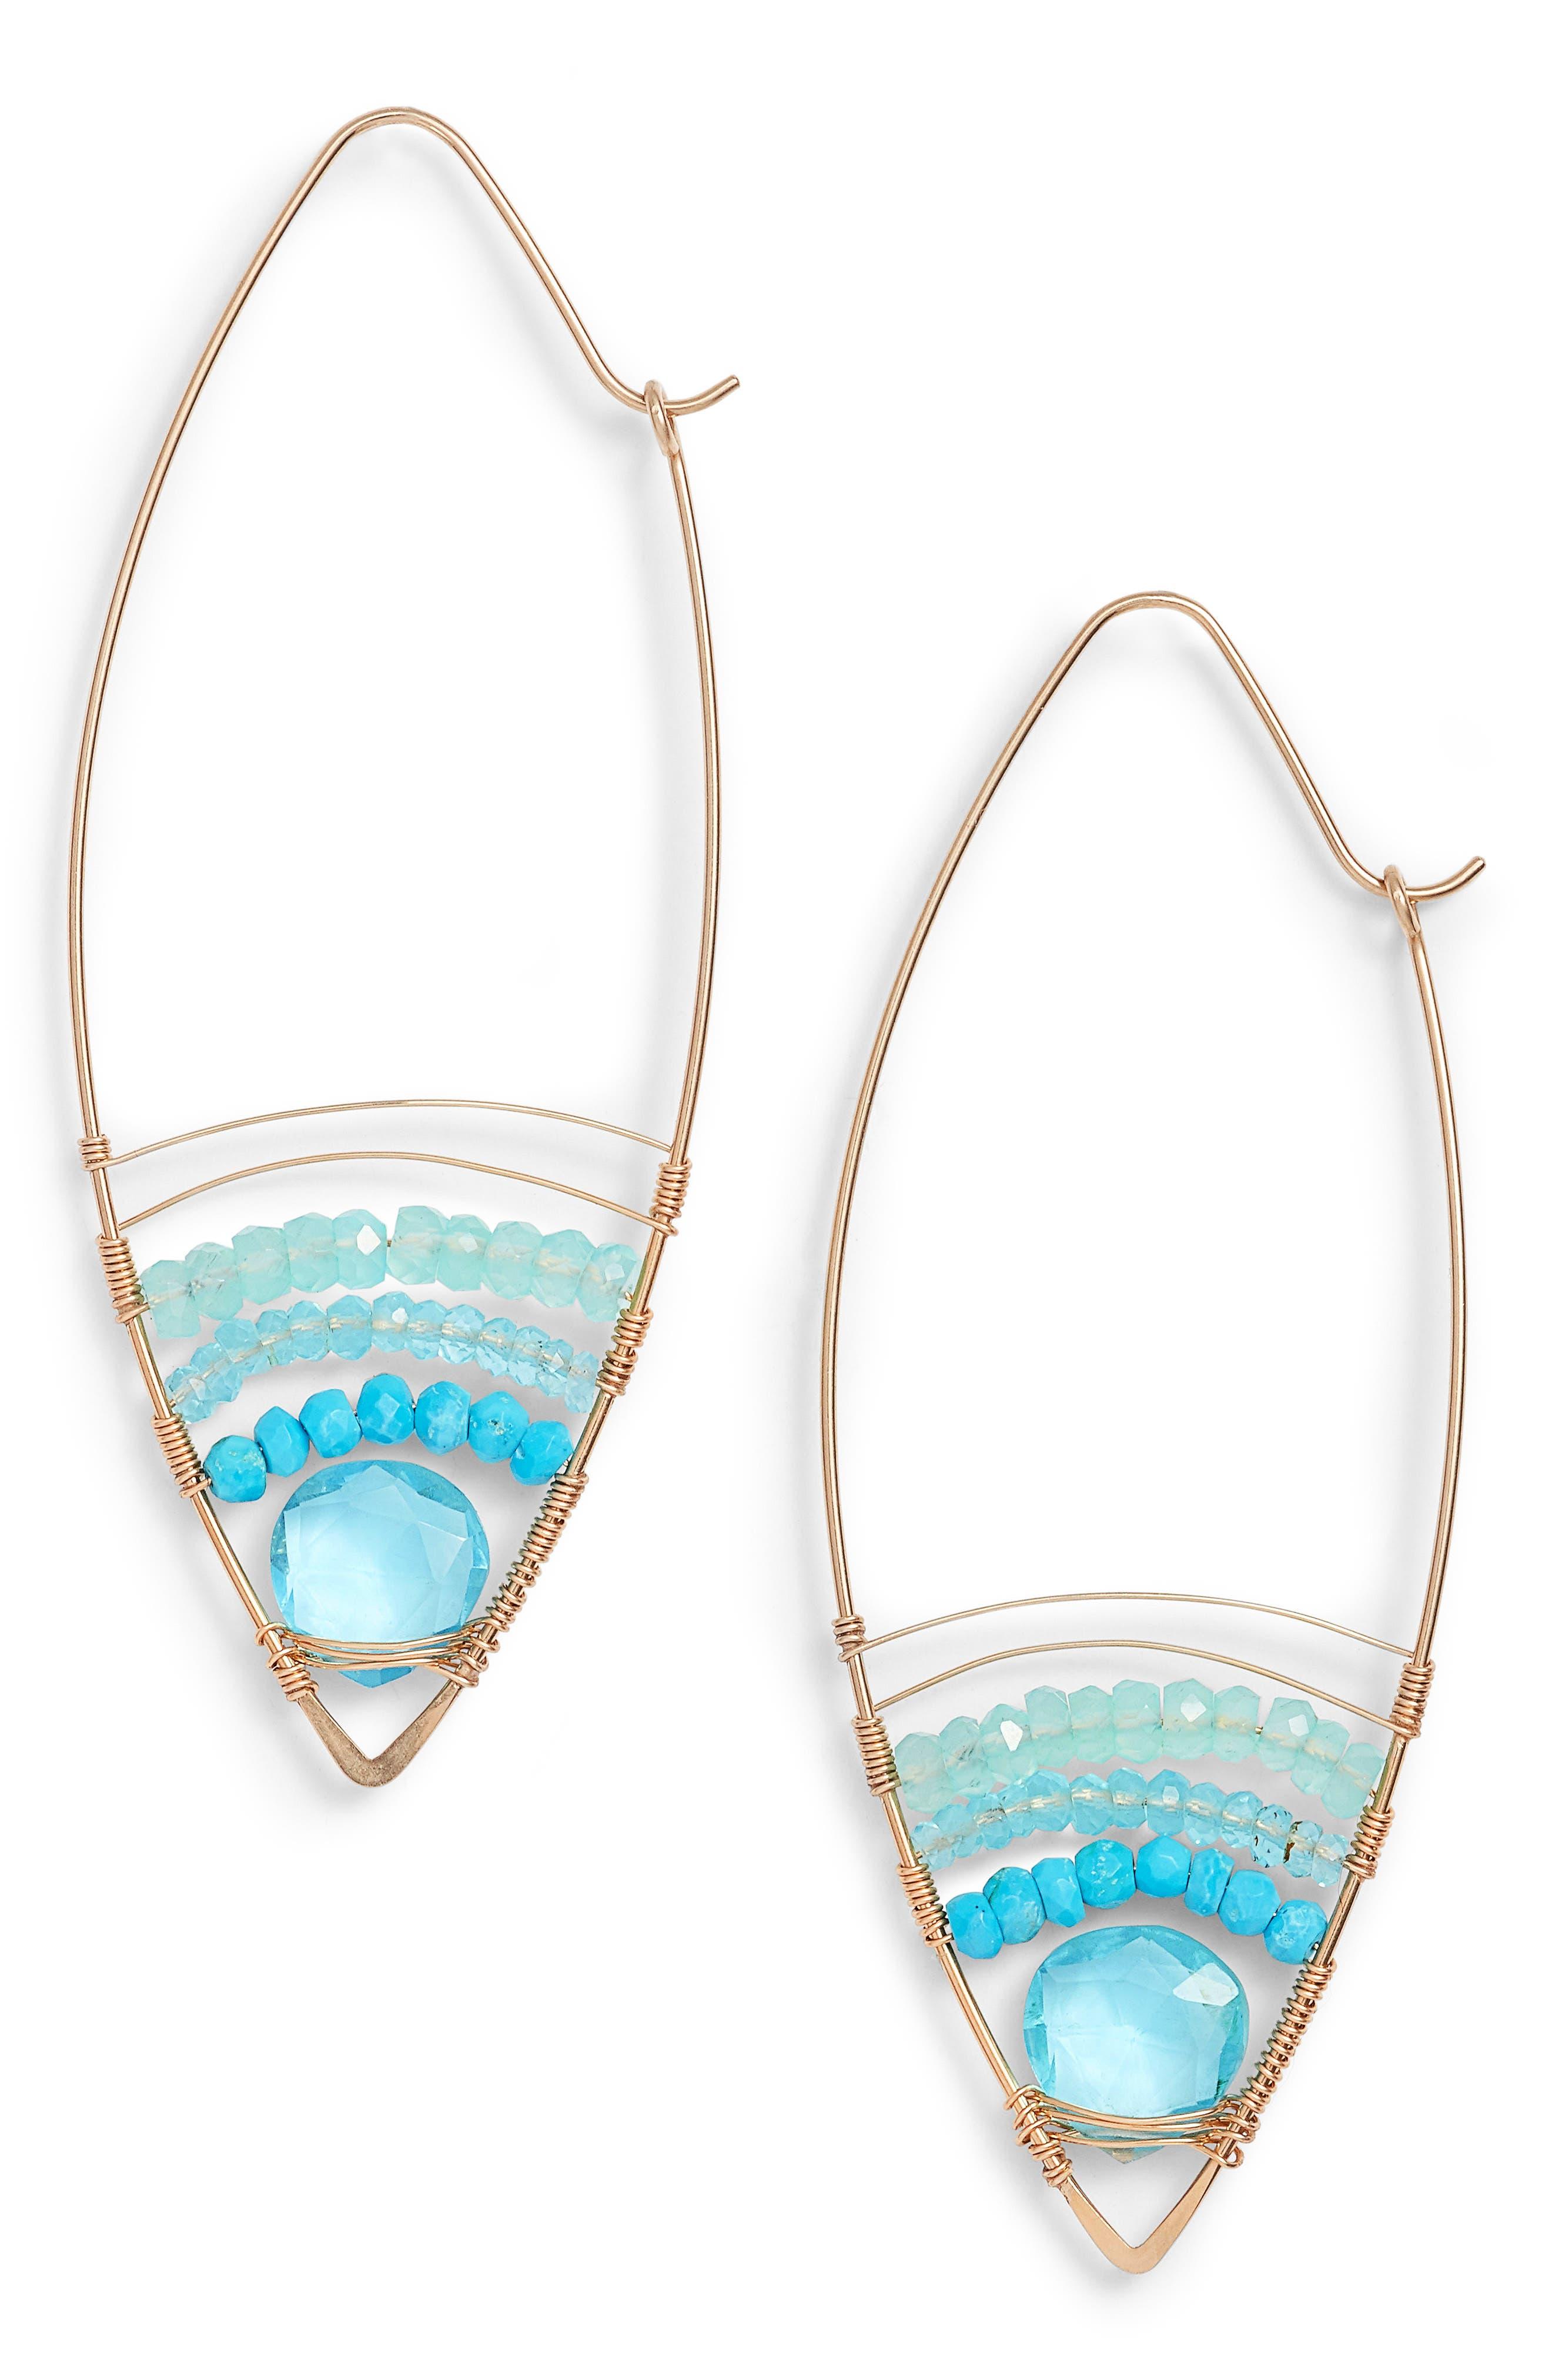 Cabana Golden Sand Oblong Hoop Earrings,                         Main,                         color, Gold Blue